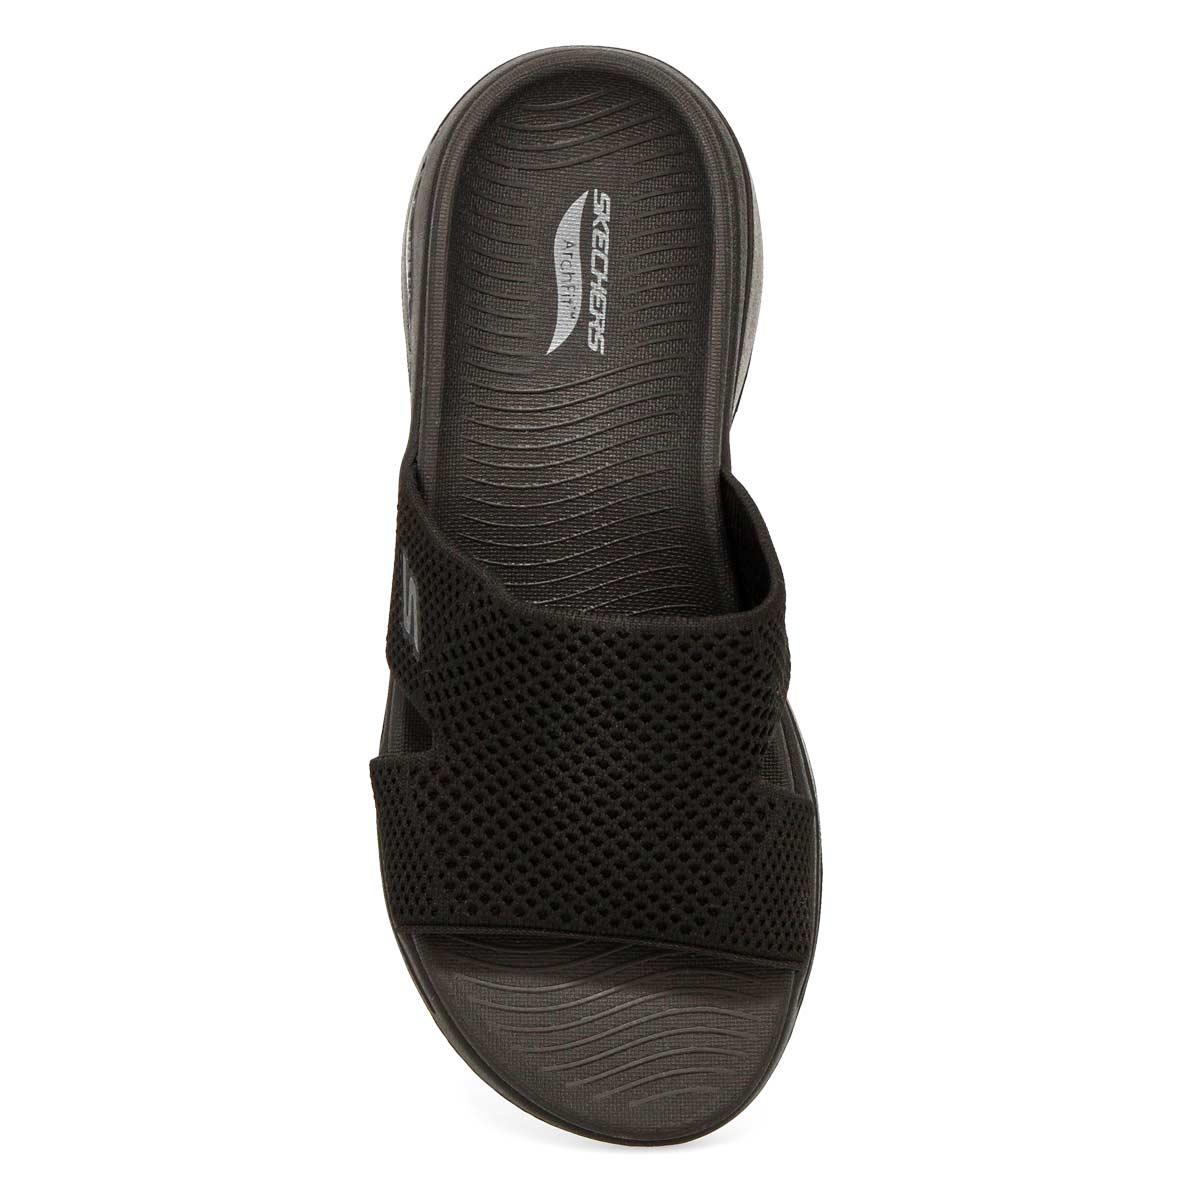 Women's Go Walk Arch Fit Sandal - Black/Black